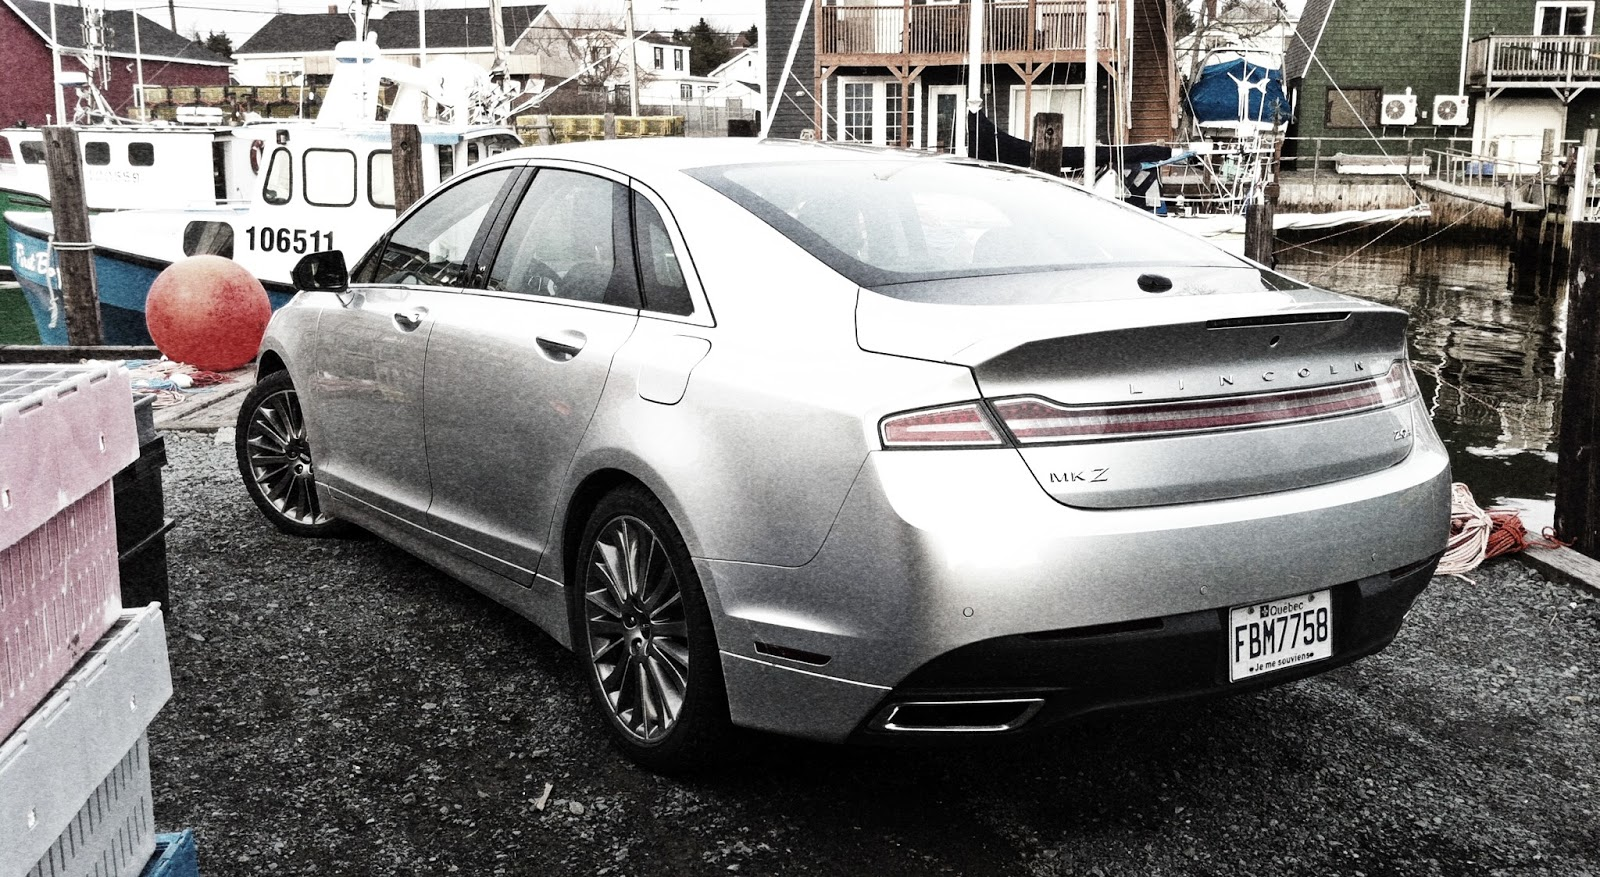 2014 Lincoln MKZ Hybrid rear angle